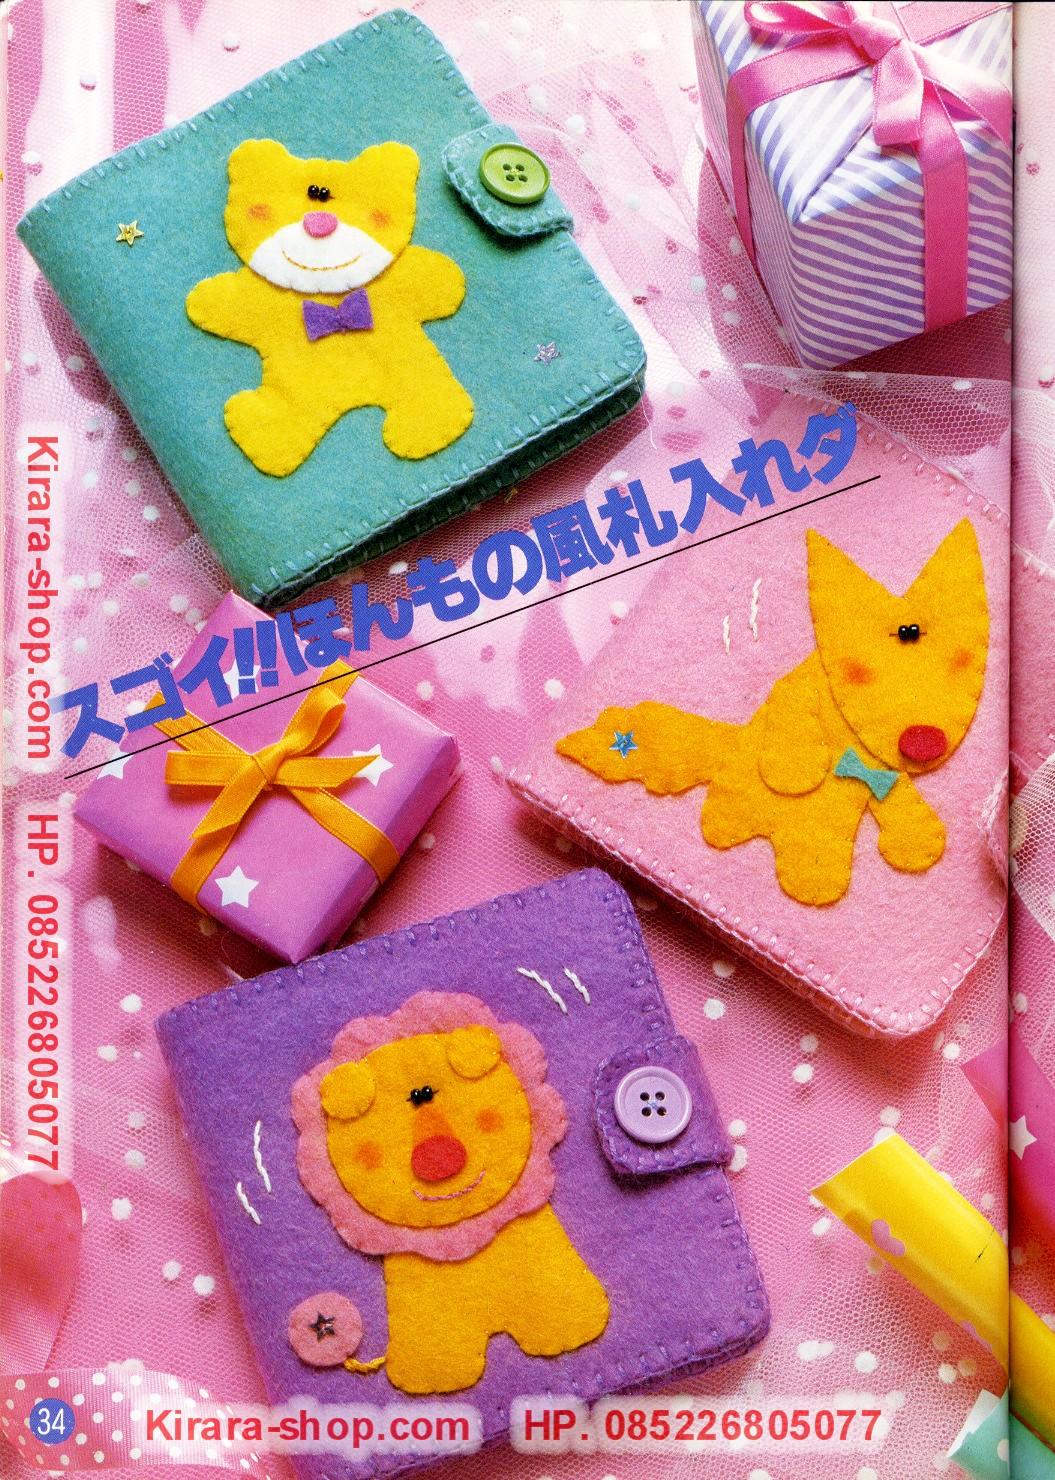 tas+kain+flanel%2C+dompet+flanel%2C+tas+flanel%2C+flanel+toys%2C+cake ...